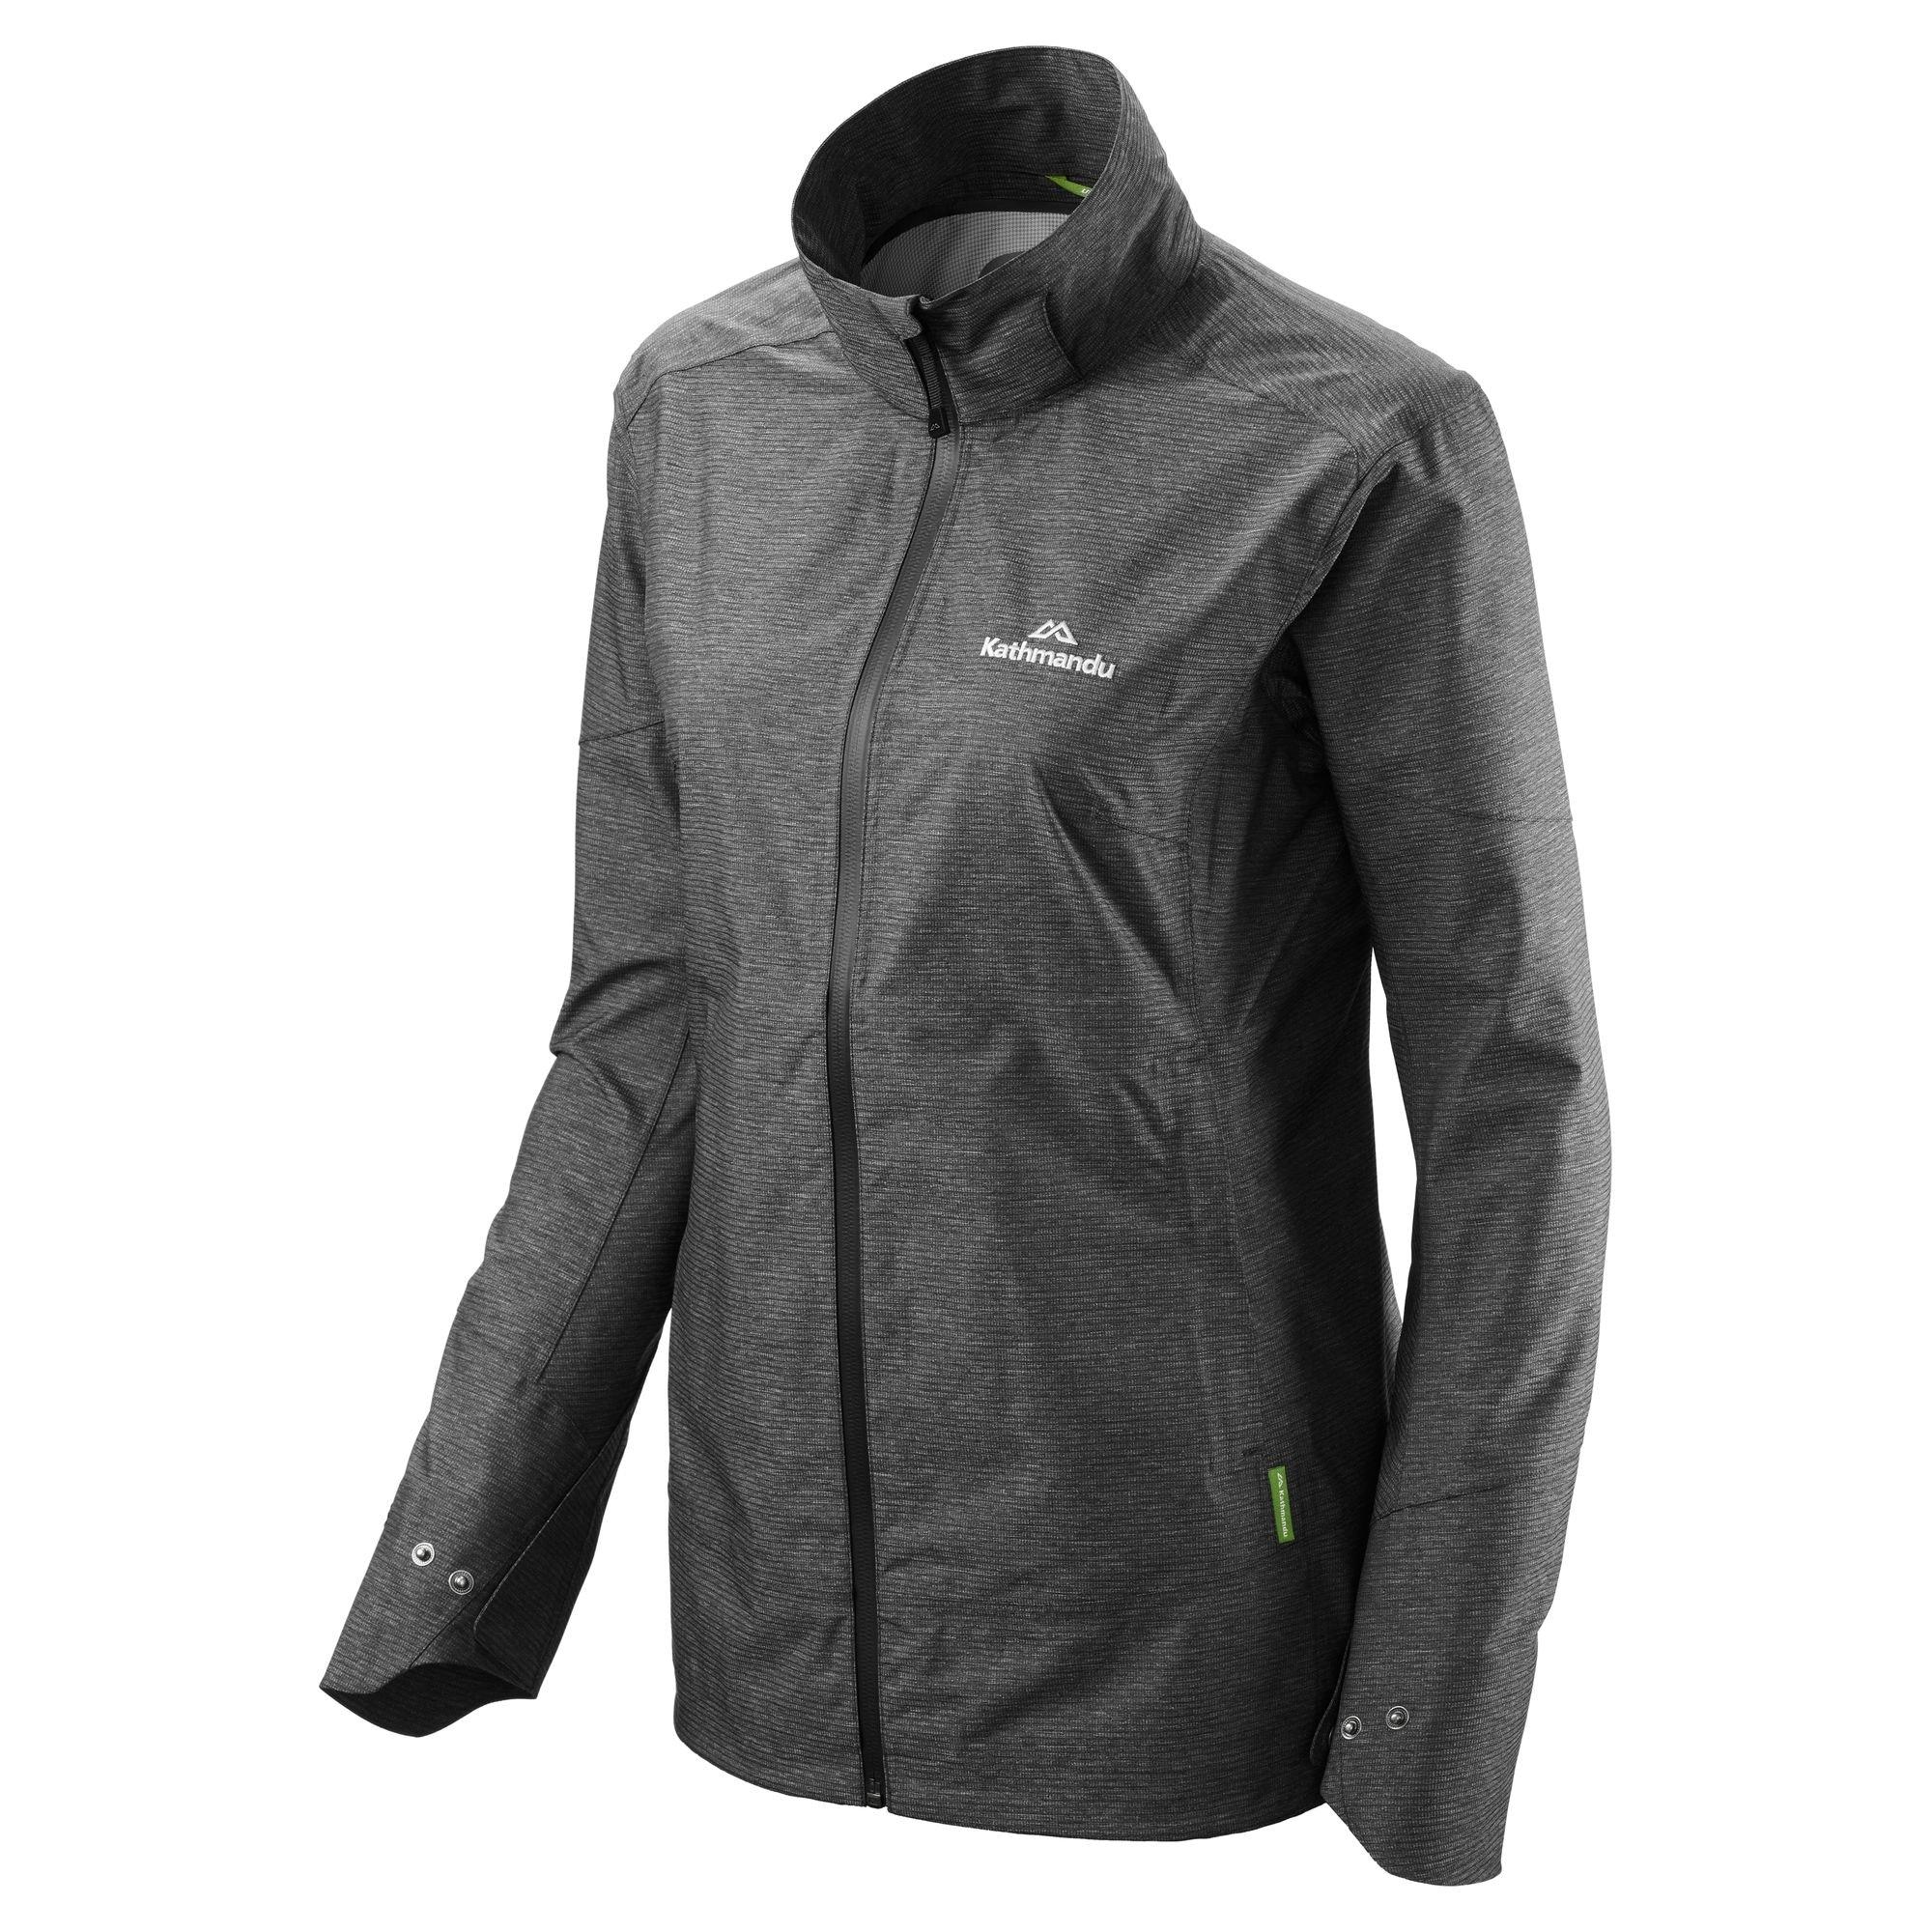 NEW-Kathmandu-Lawrence-Women-039-s-ngx-Windproof-Waterproof-Outdoor-Rain-Jacket-v2 thumbnail 9